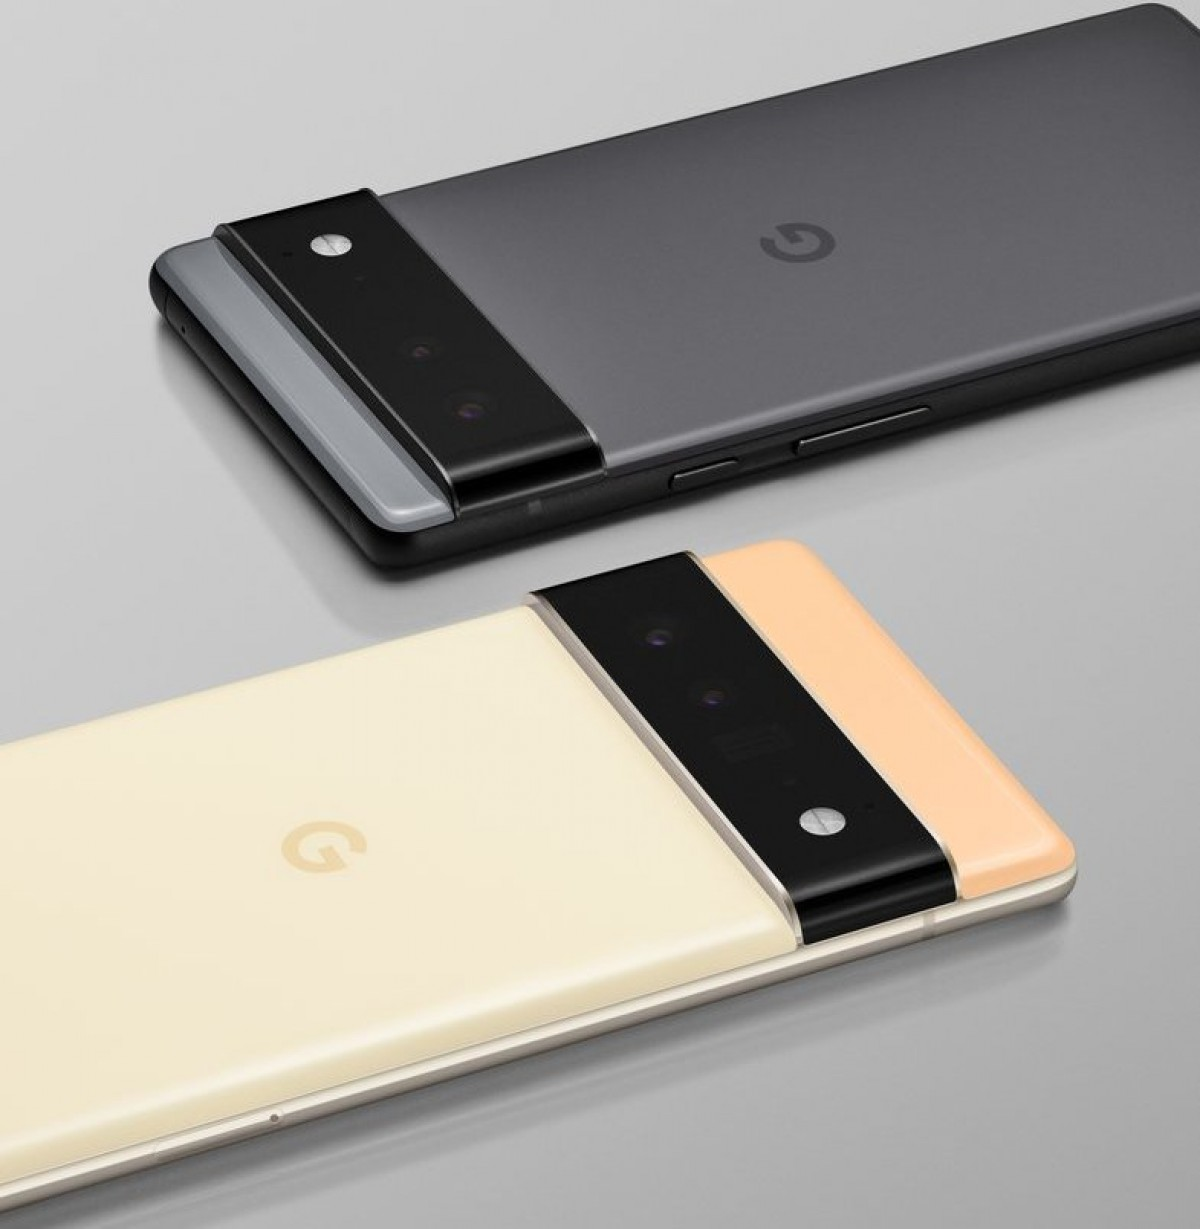 Google's Custom Tensor Chip May be a Rebranded Samsung SoC